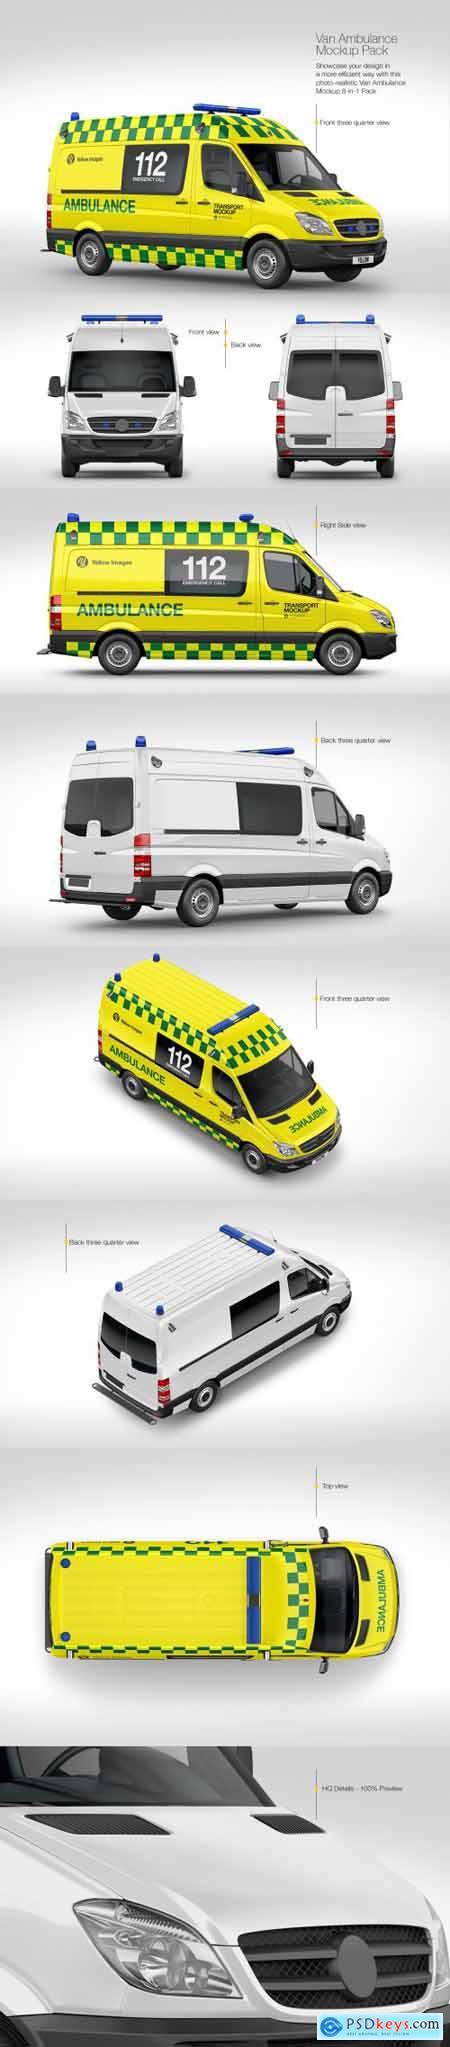 Van Ambulance Mockup Pack 69760